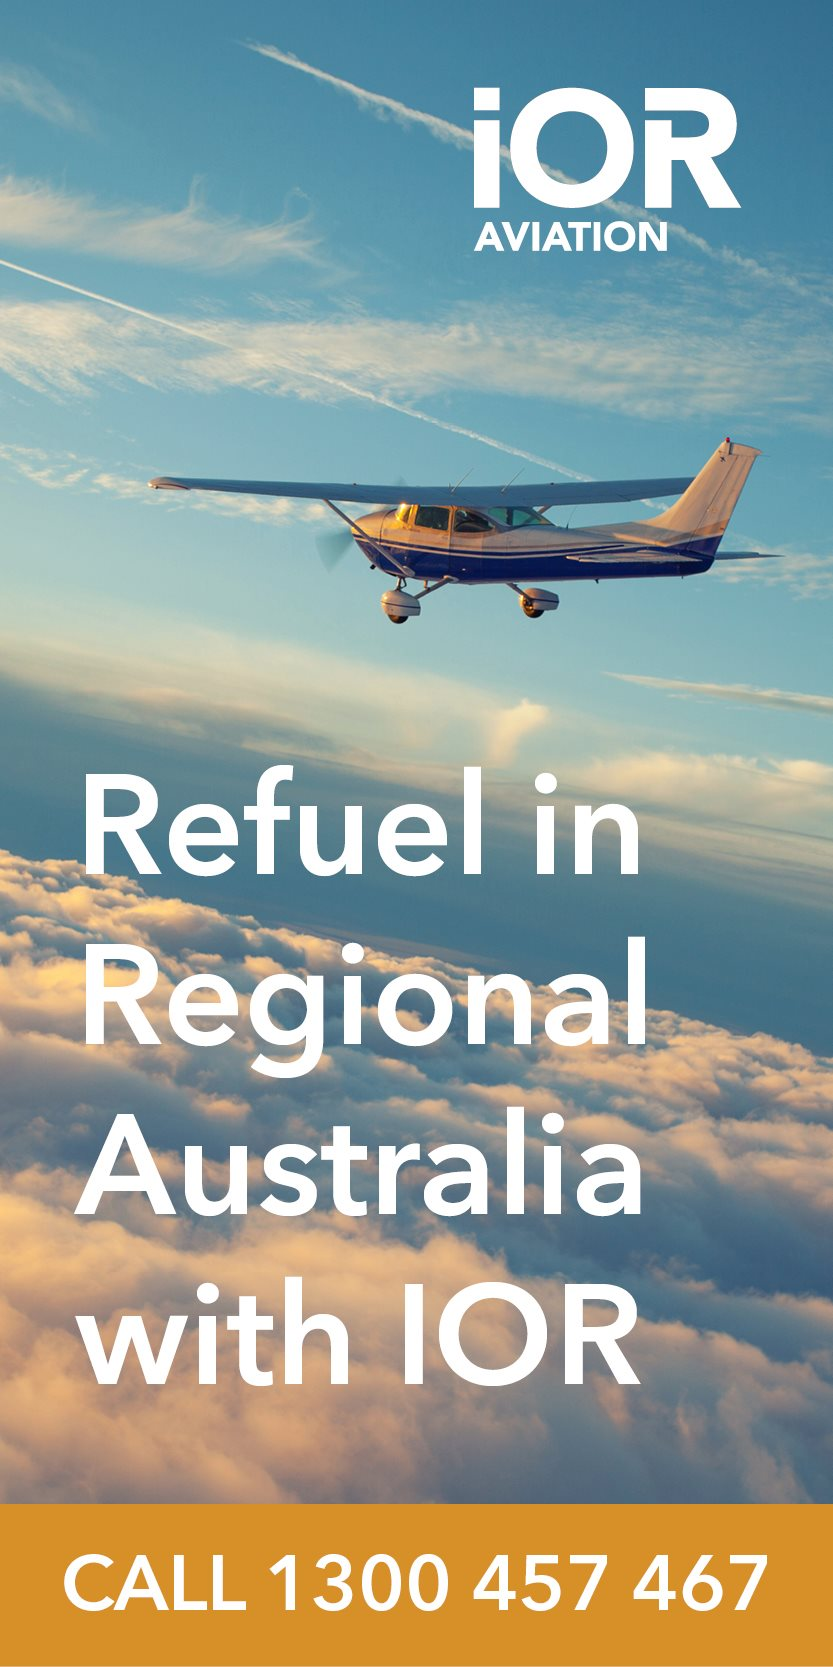 Regional Australia Refuel with IOR October